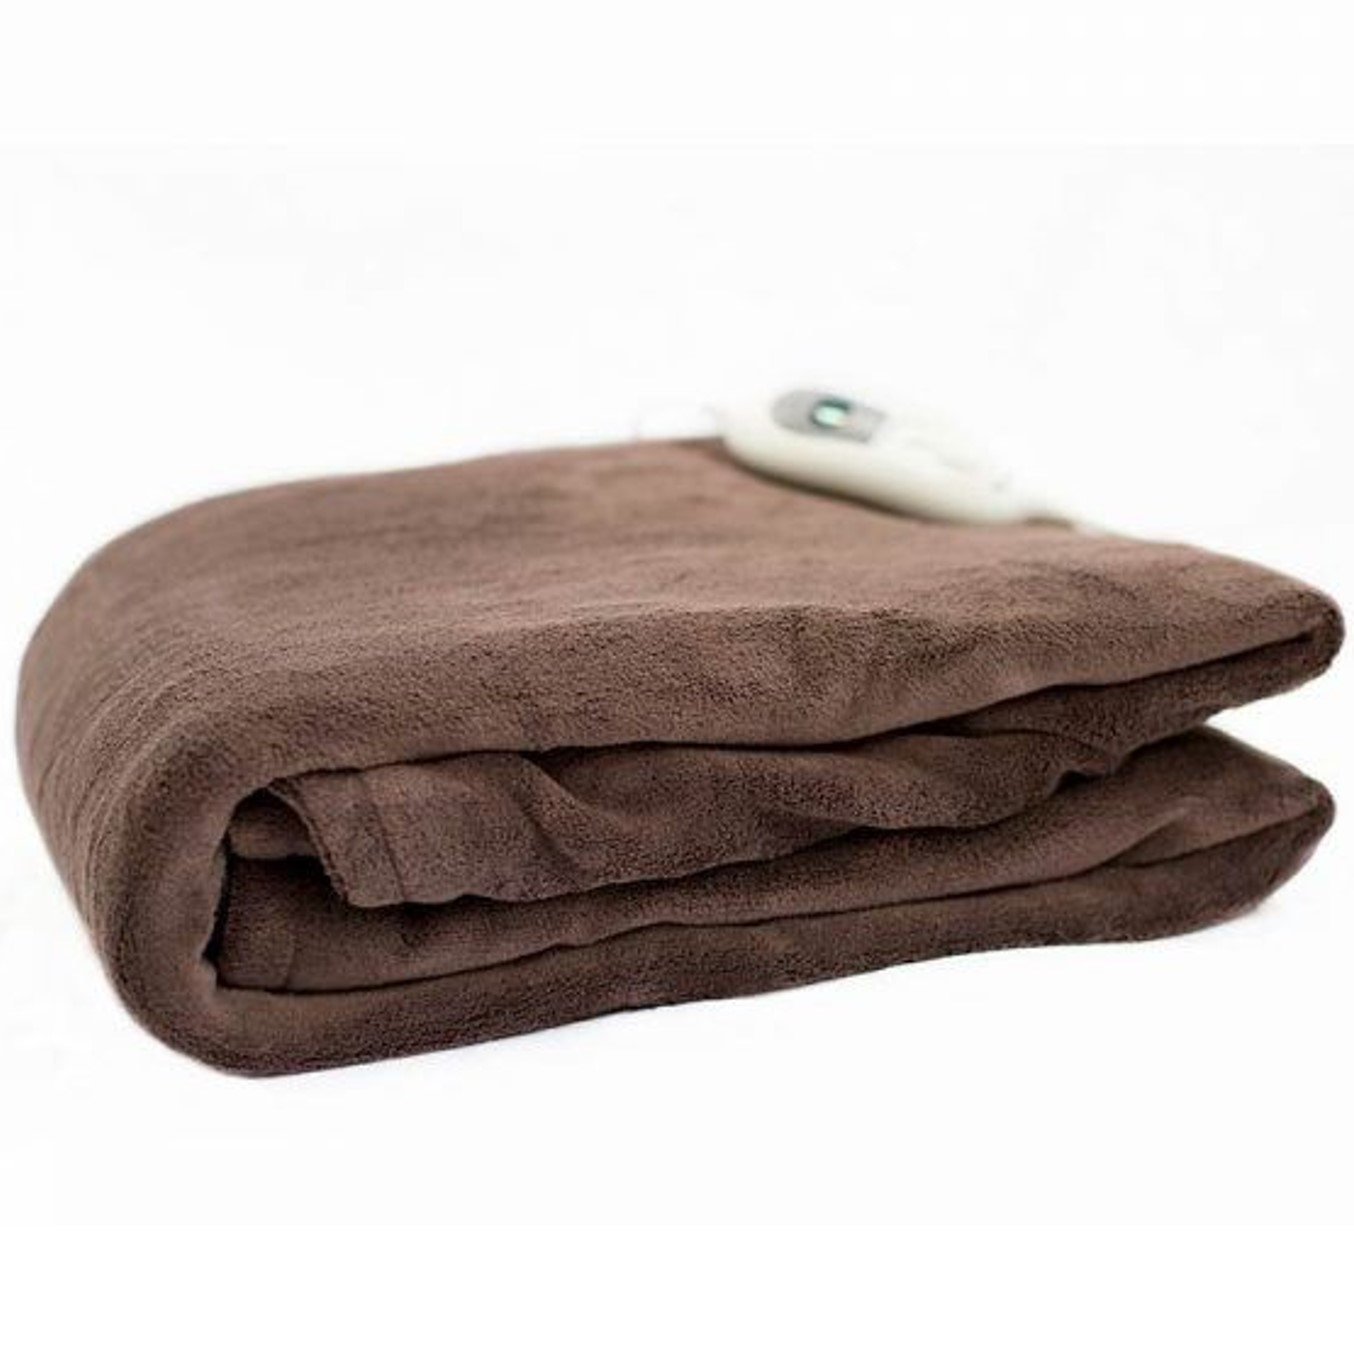 Manta calienta camas astan hogar ah - ah52010 termoregulable doble cara waarm